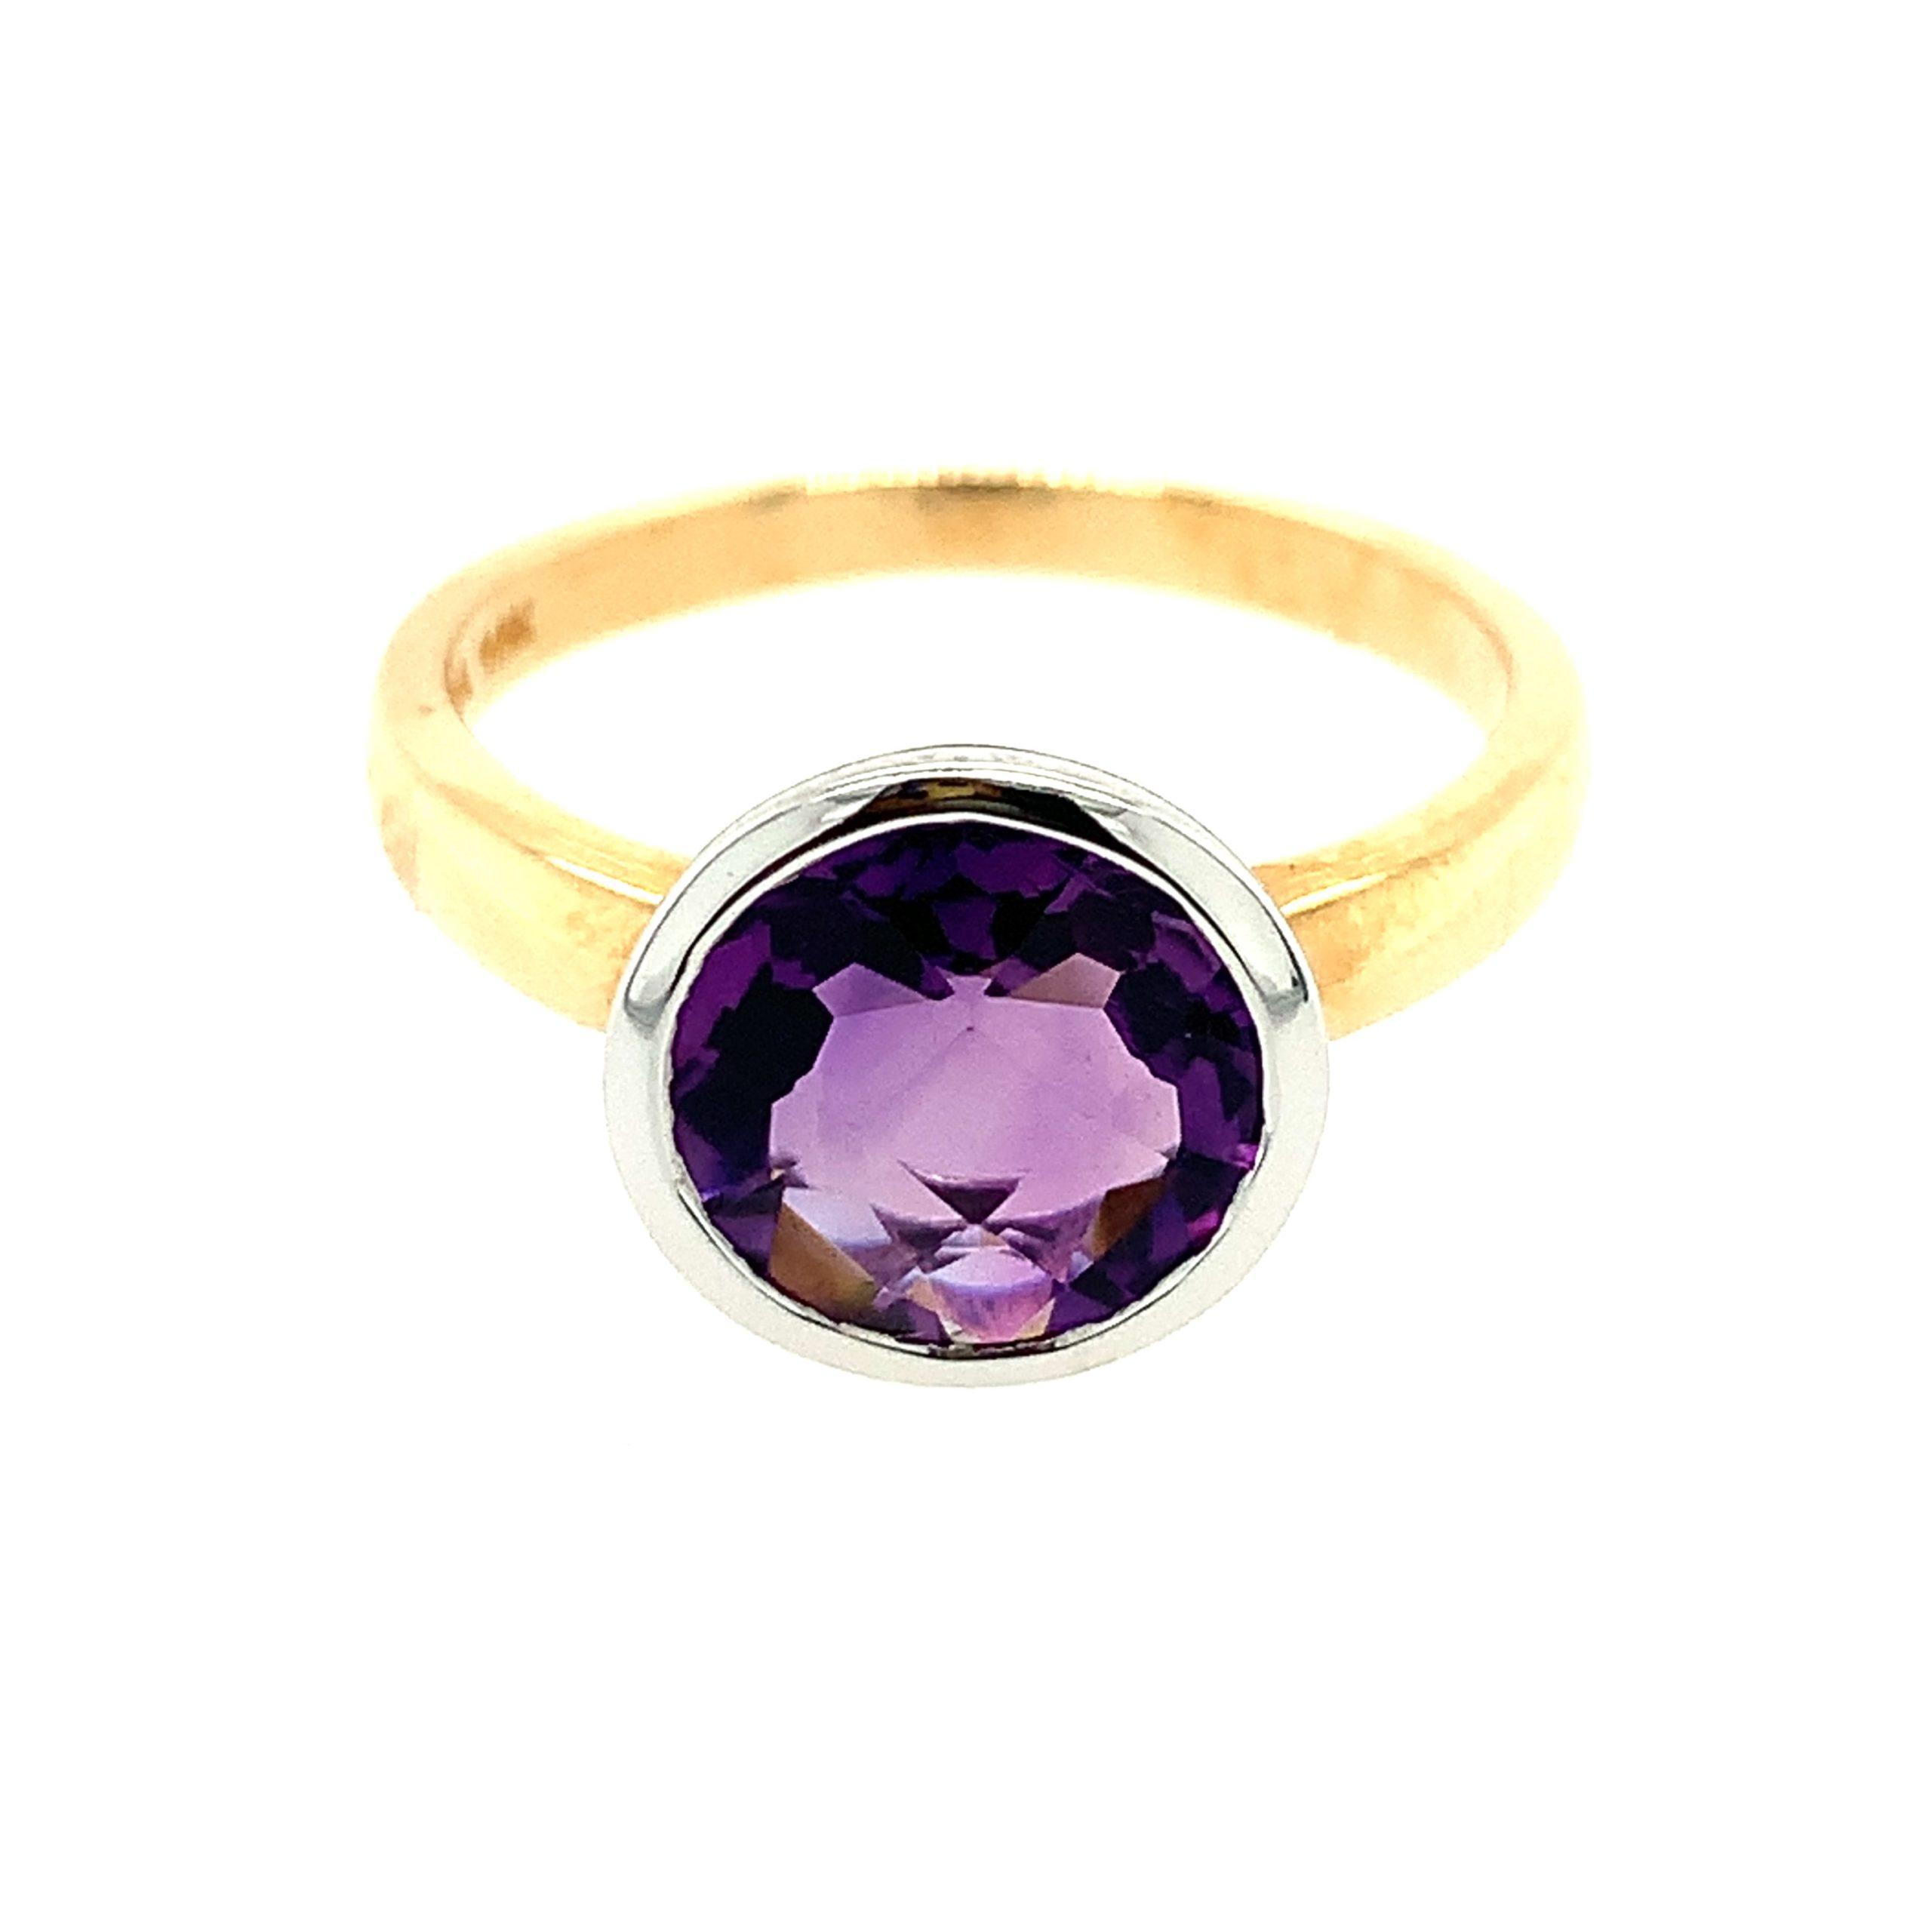 Two-Tone Amethyst Ring